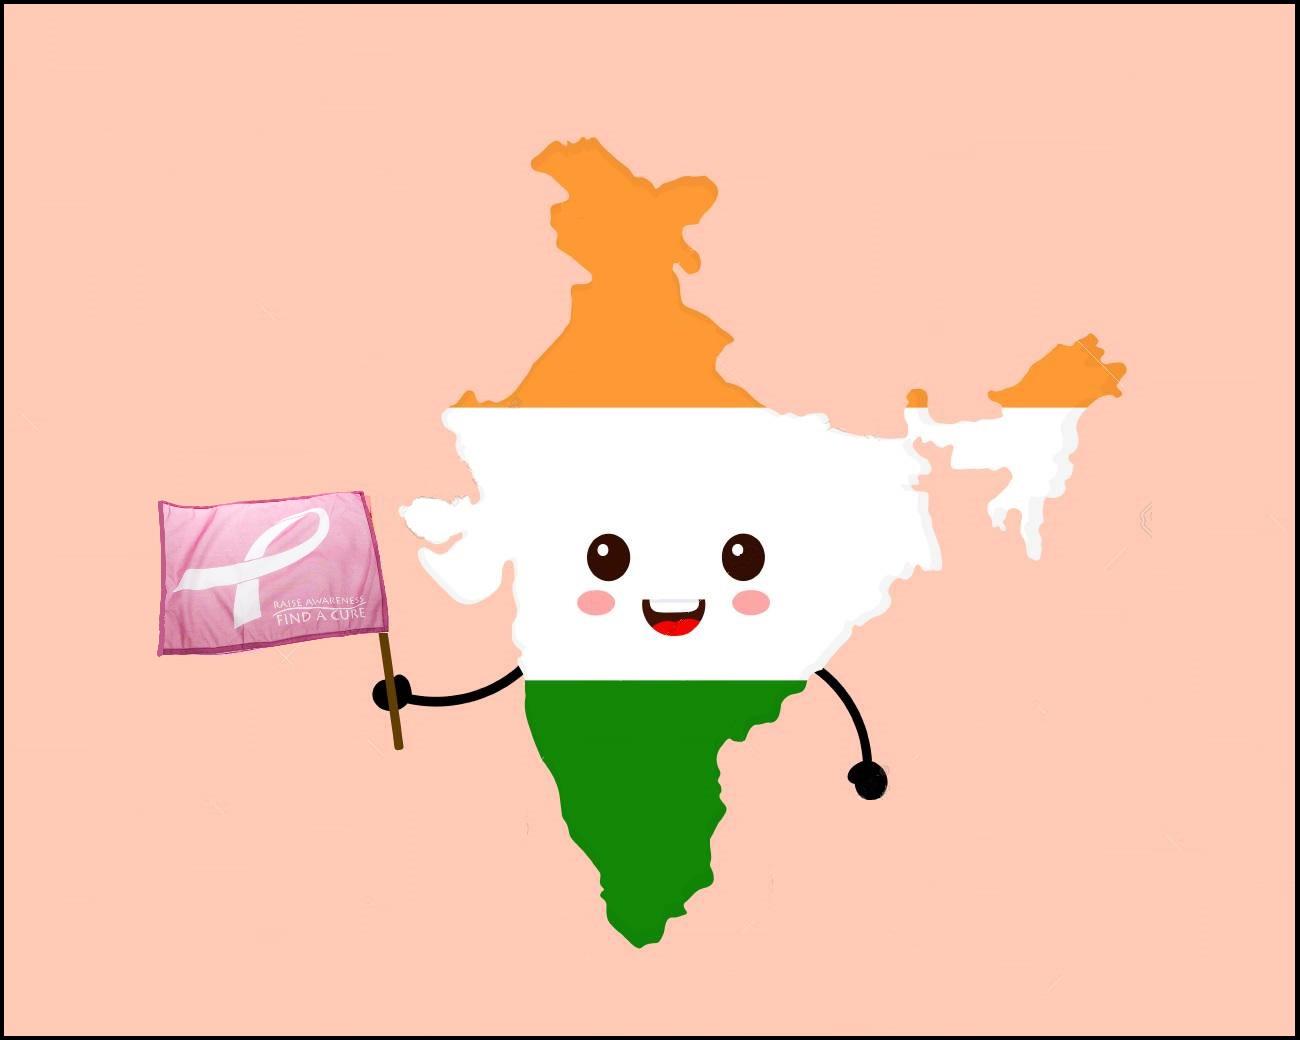 Colon cancer in India